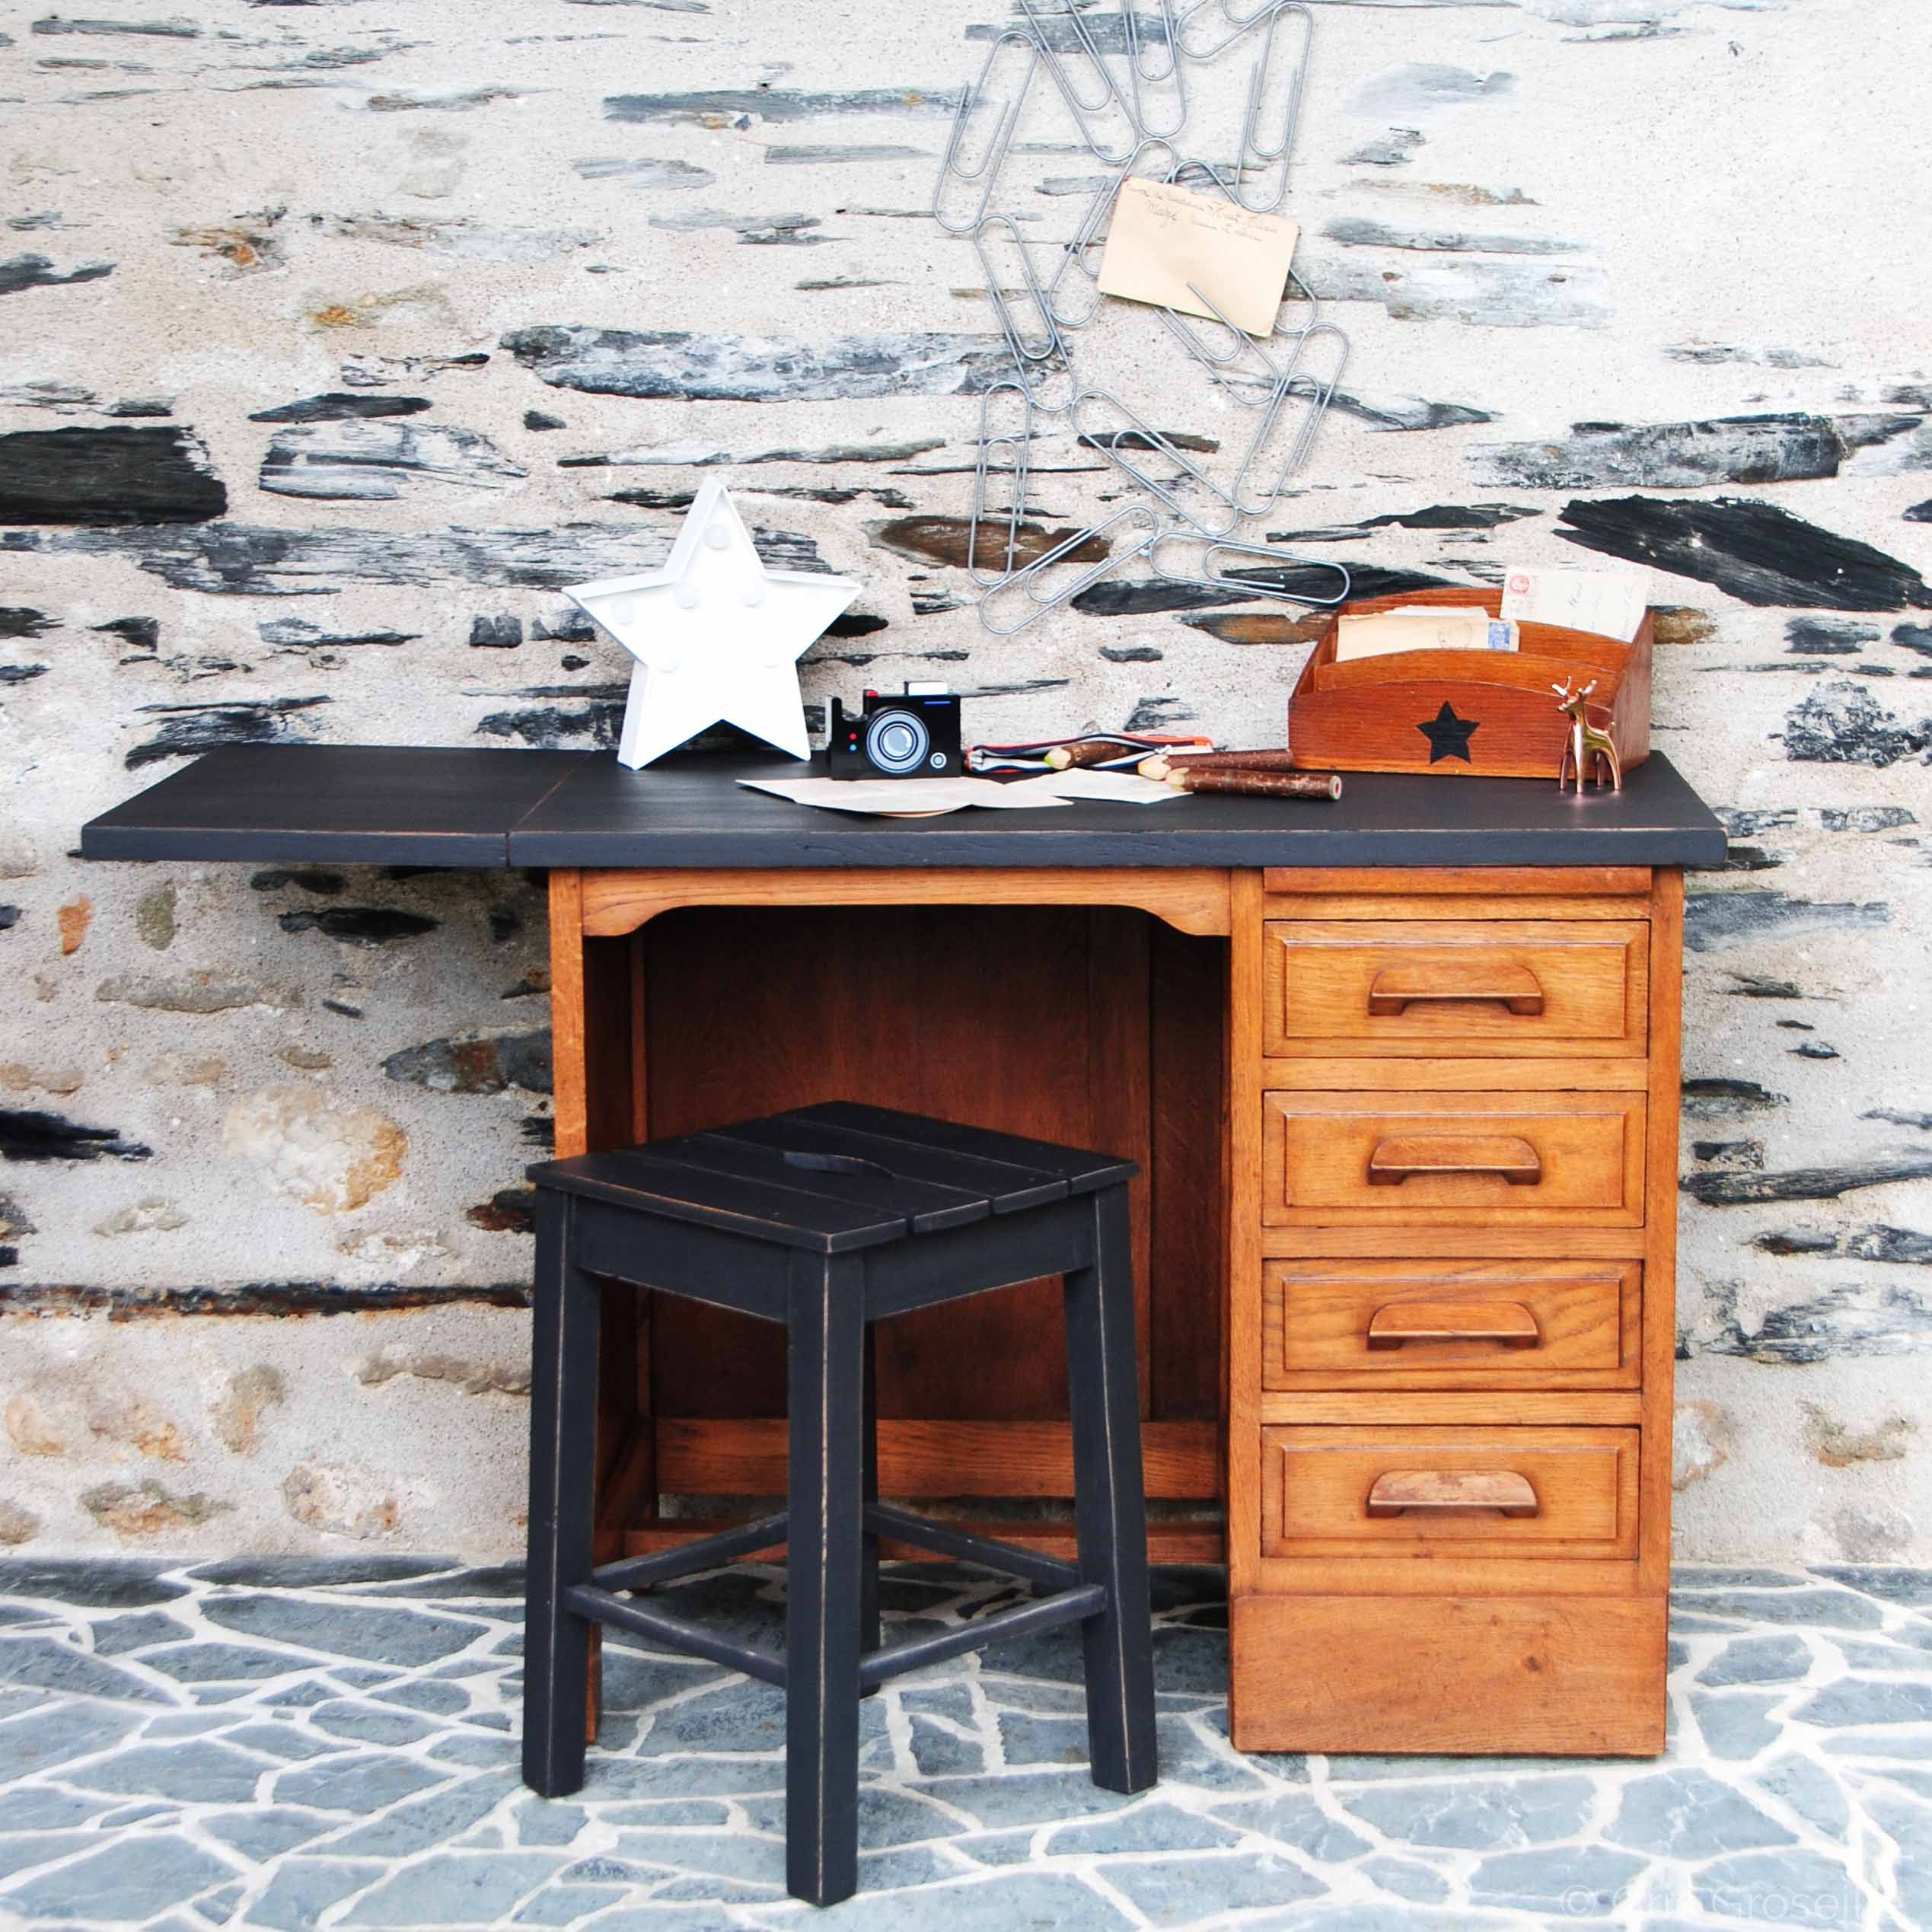 Collection Special Rentree Deco Meubles Grisgroseille Com Mobilier De Salon Meuble Deco Relooking Meuble